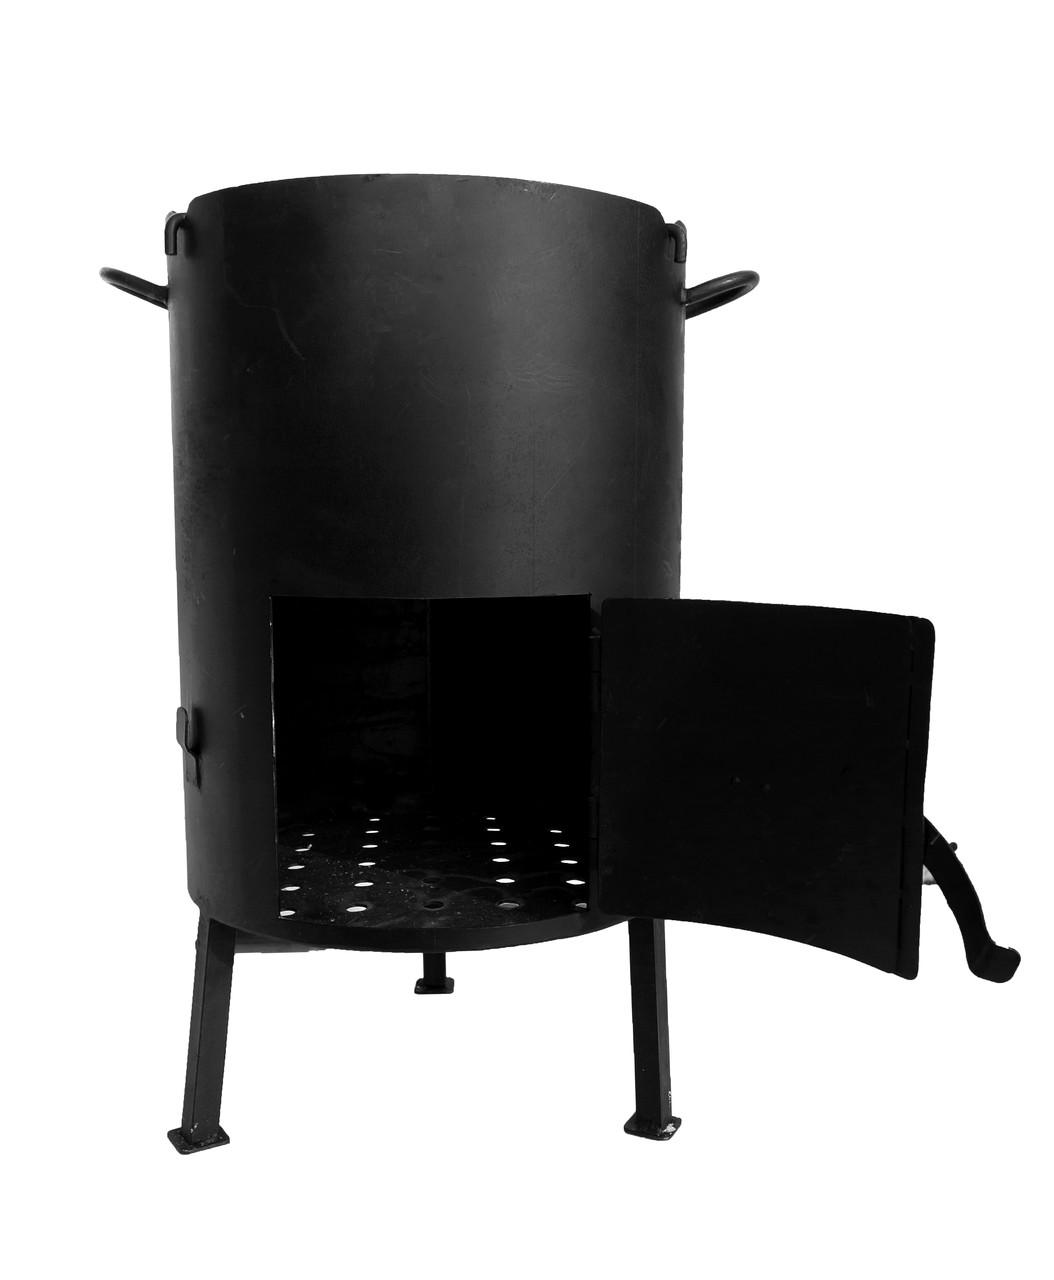 Печка буржуйка  d 500мм сталь 3мм